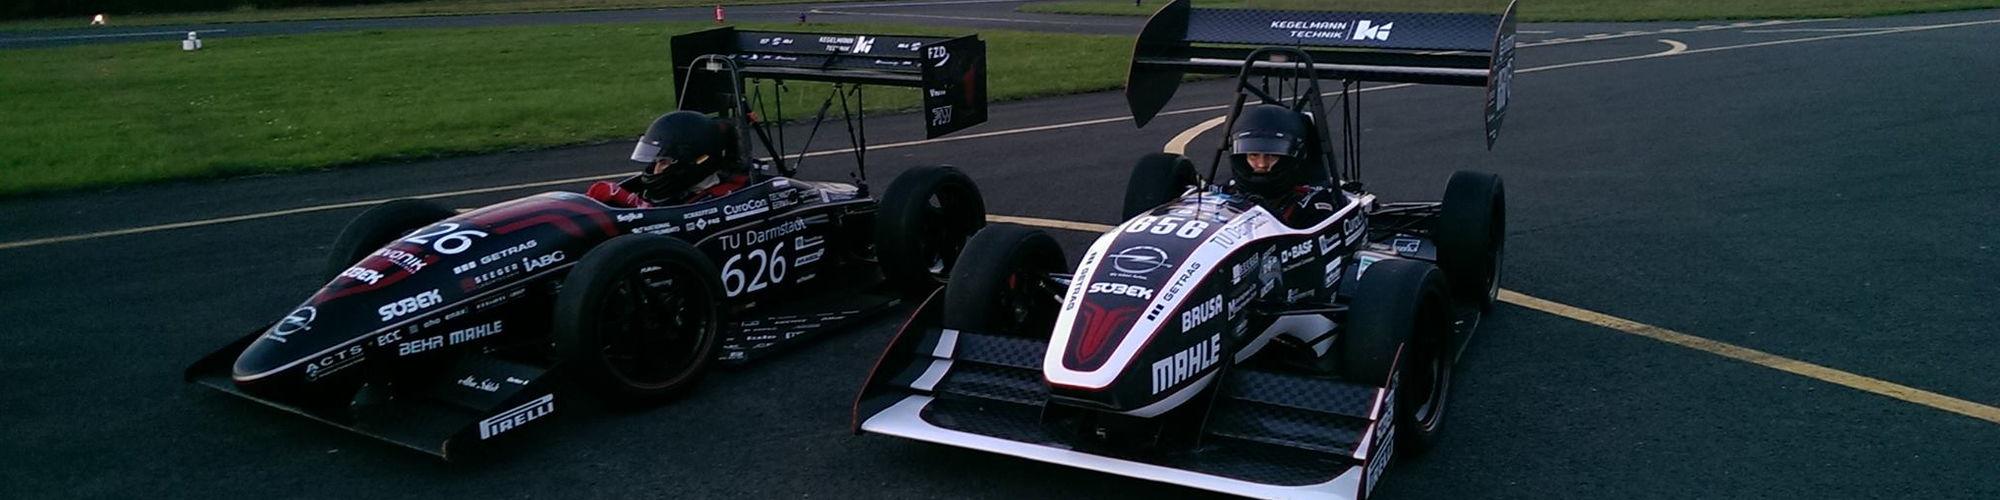 DART Racing  cover image